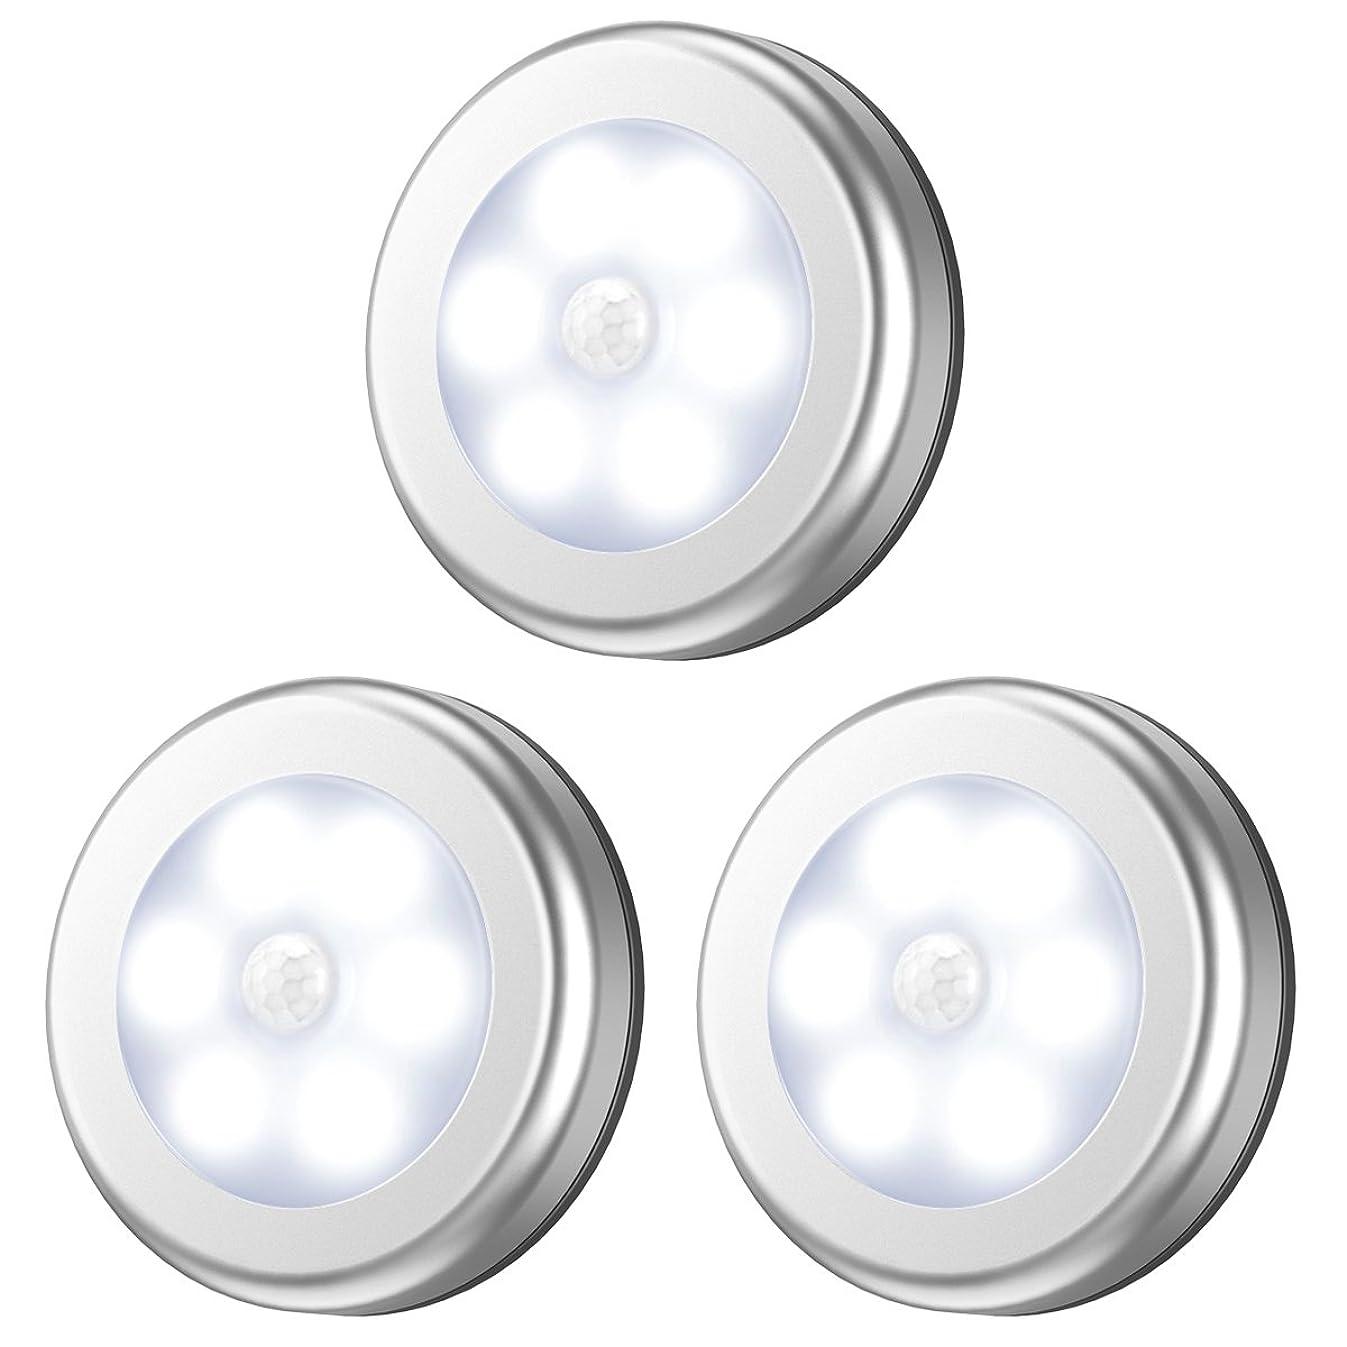 AMIR Motion Sensor Light, Battery-Powered Closet Lights, Stair Lights, Tap Lights, Wall Light for Entrance, Hallway,Garage, Bathroom (White - Pack of 3)